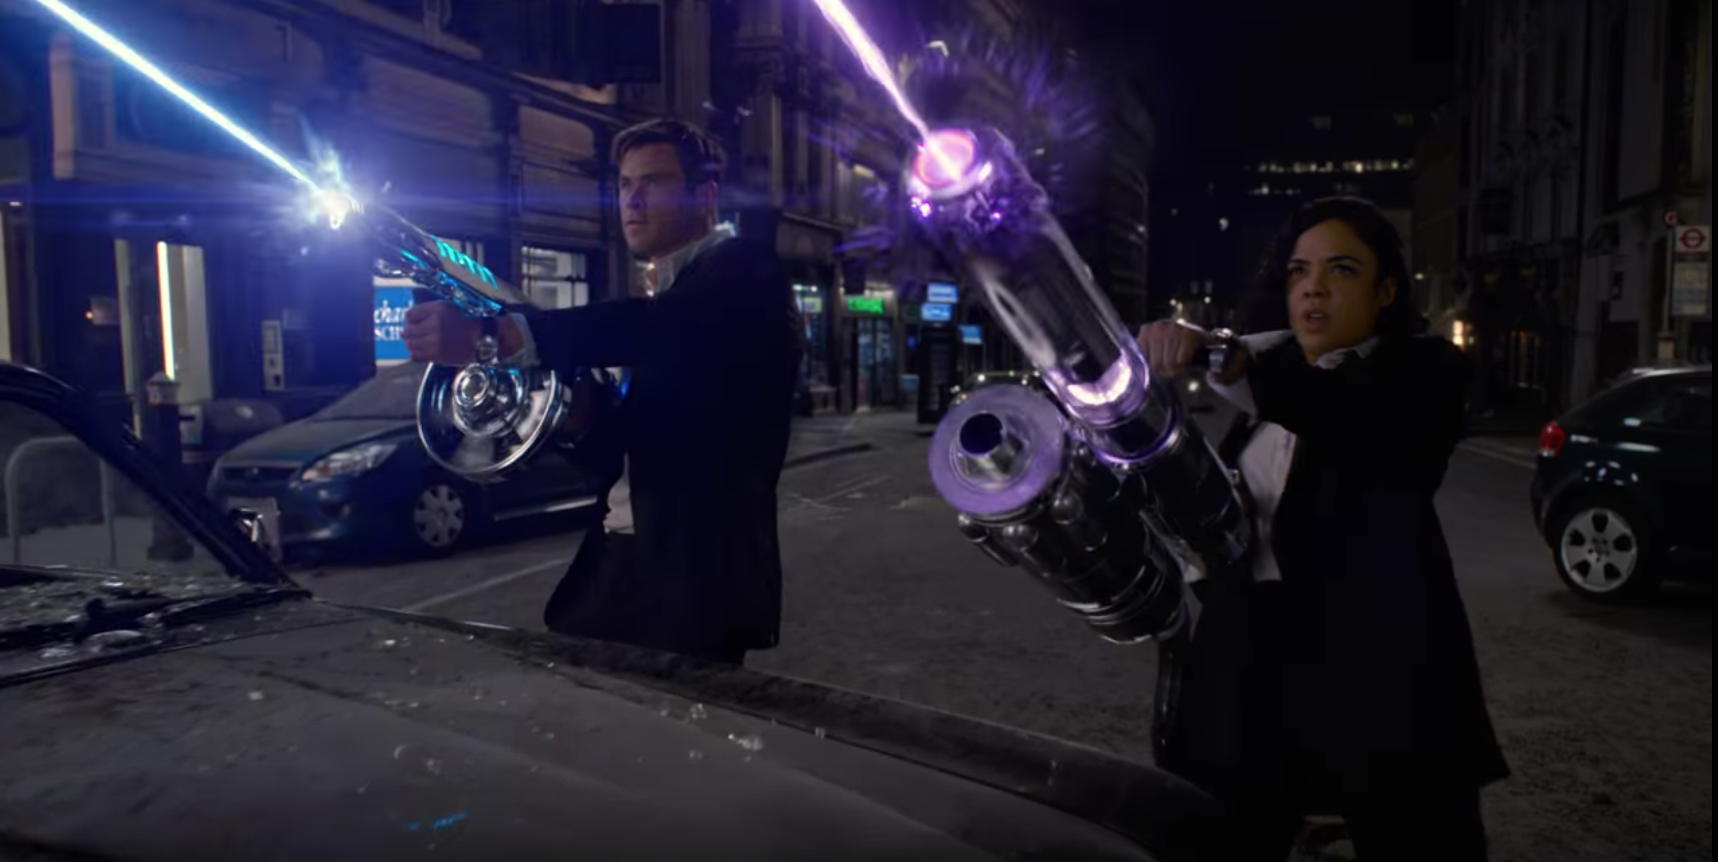 《MIB星際戰警:跨國行動》正式預告:H&M 探員登場!首圖